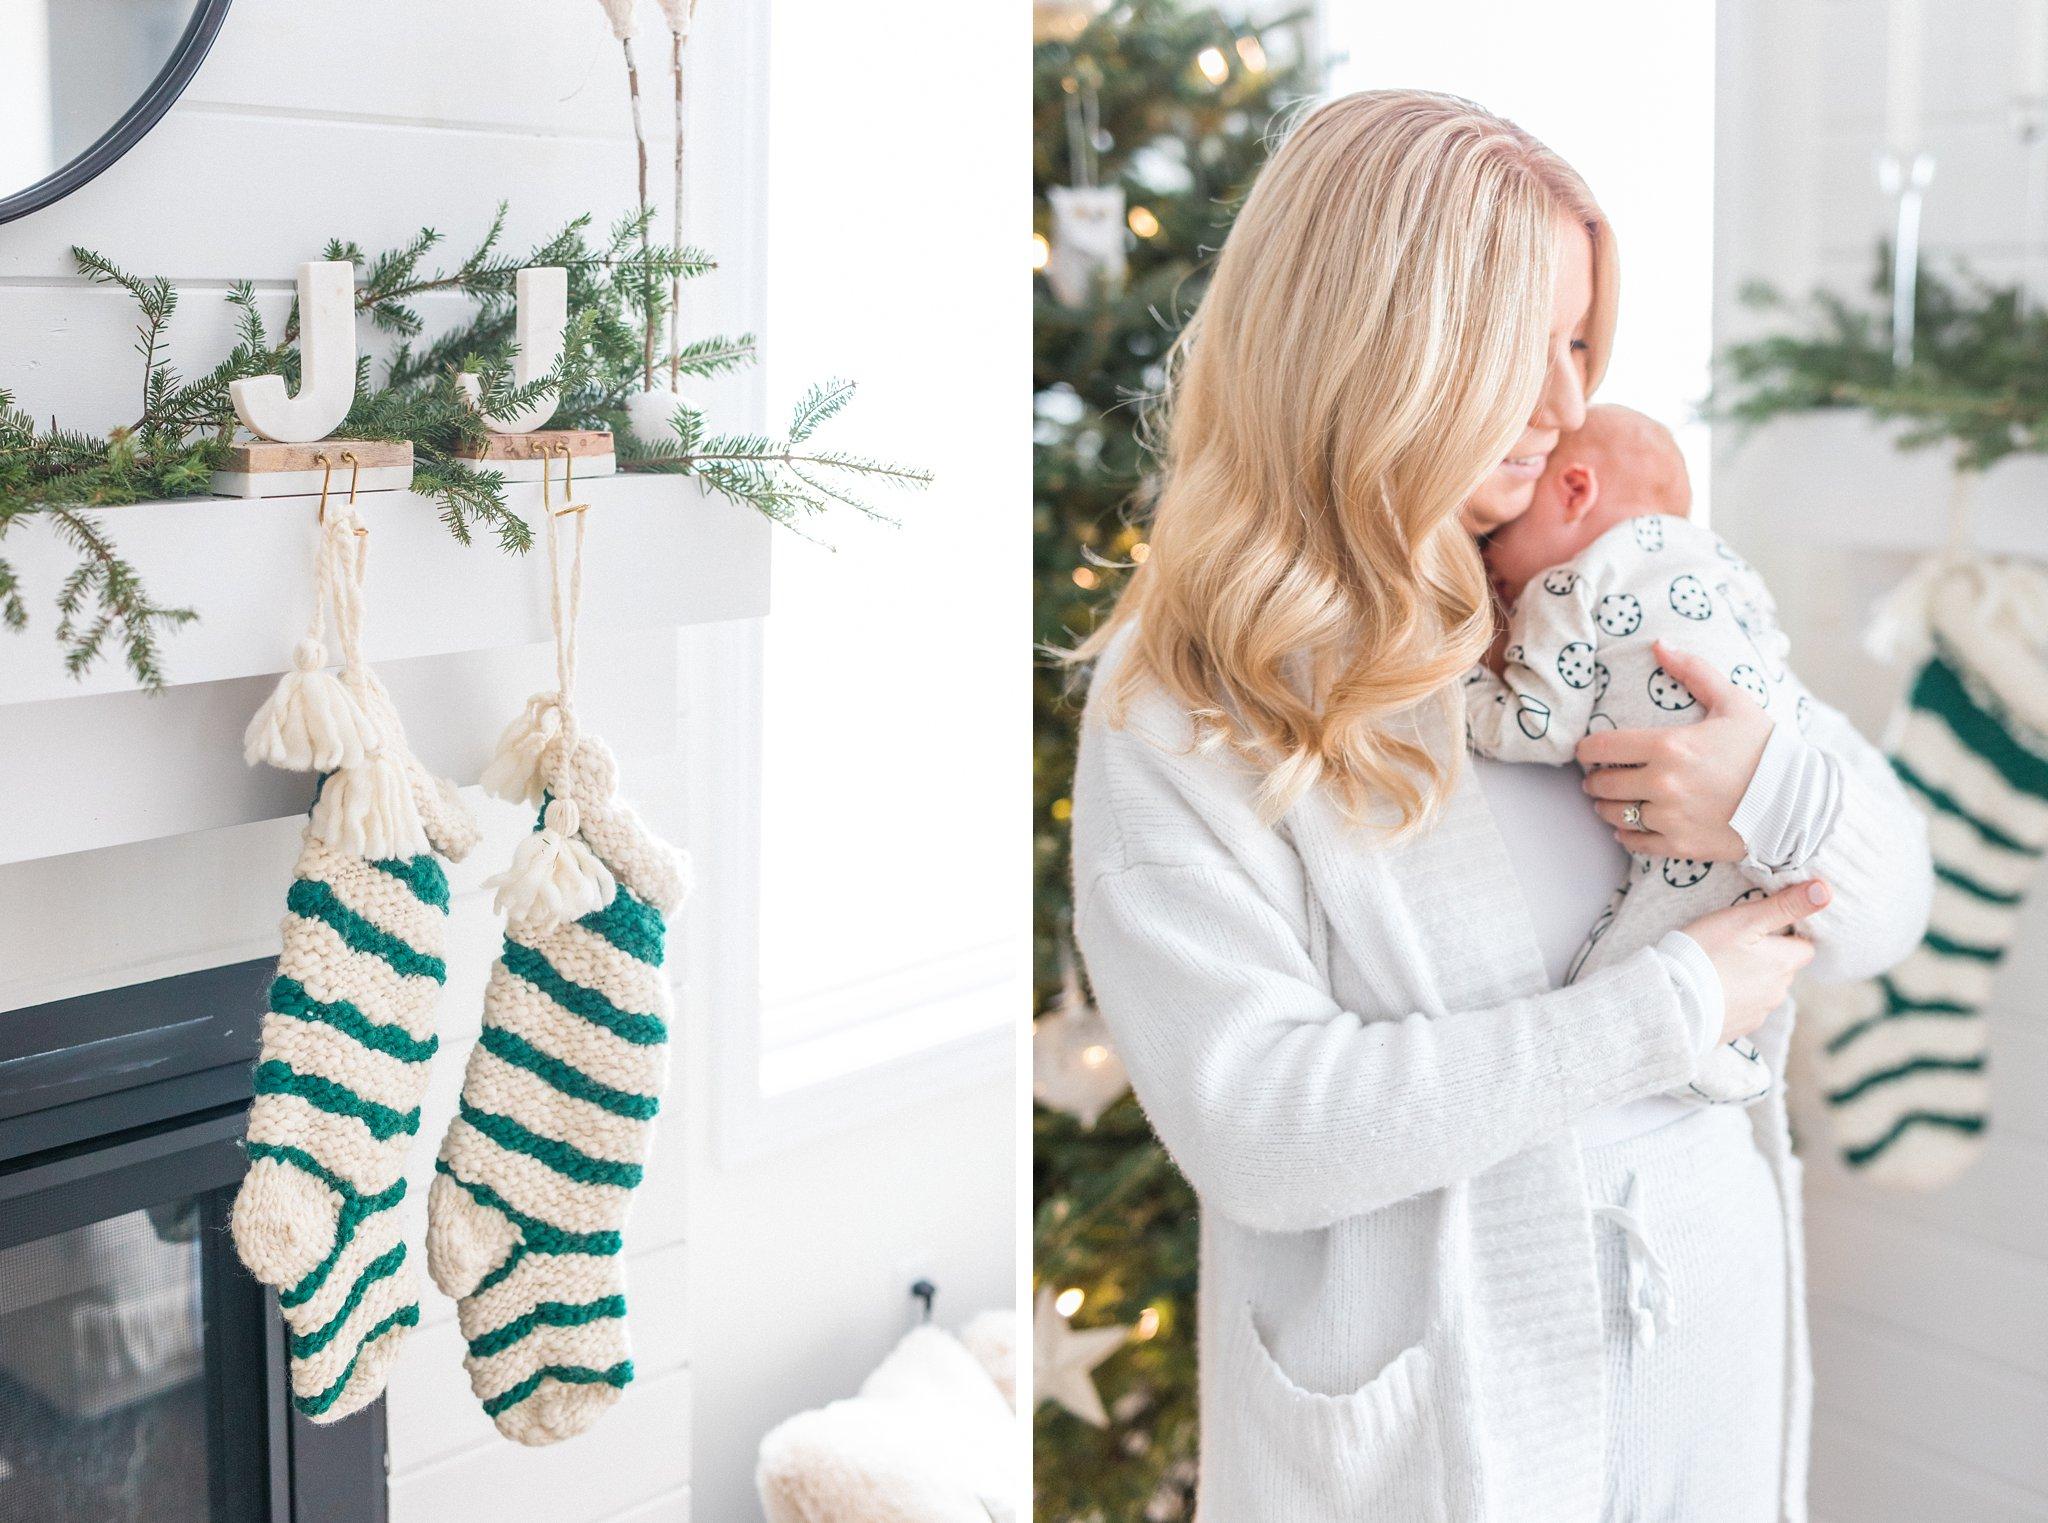 Festive Newborn Lifestyle Photos During the Christmas Holidays